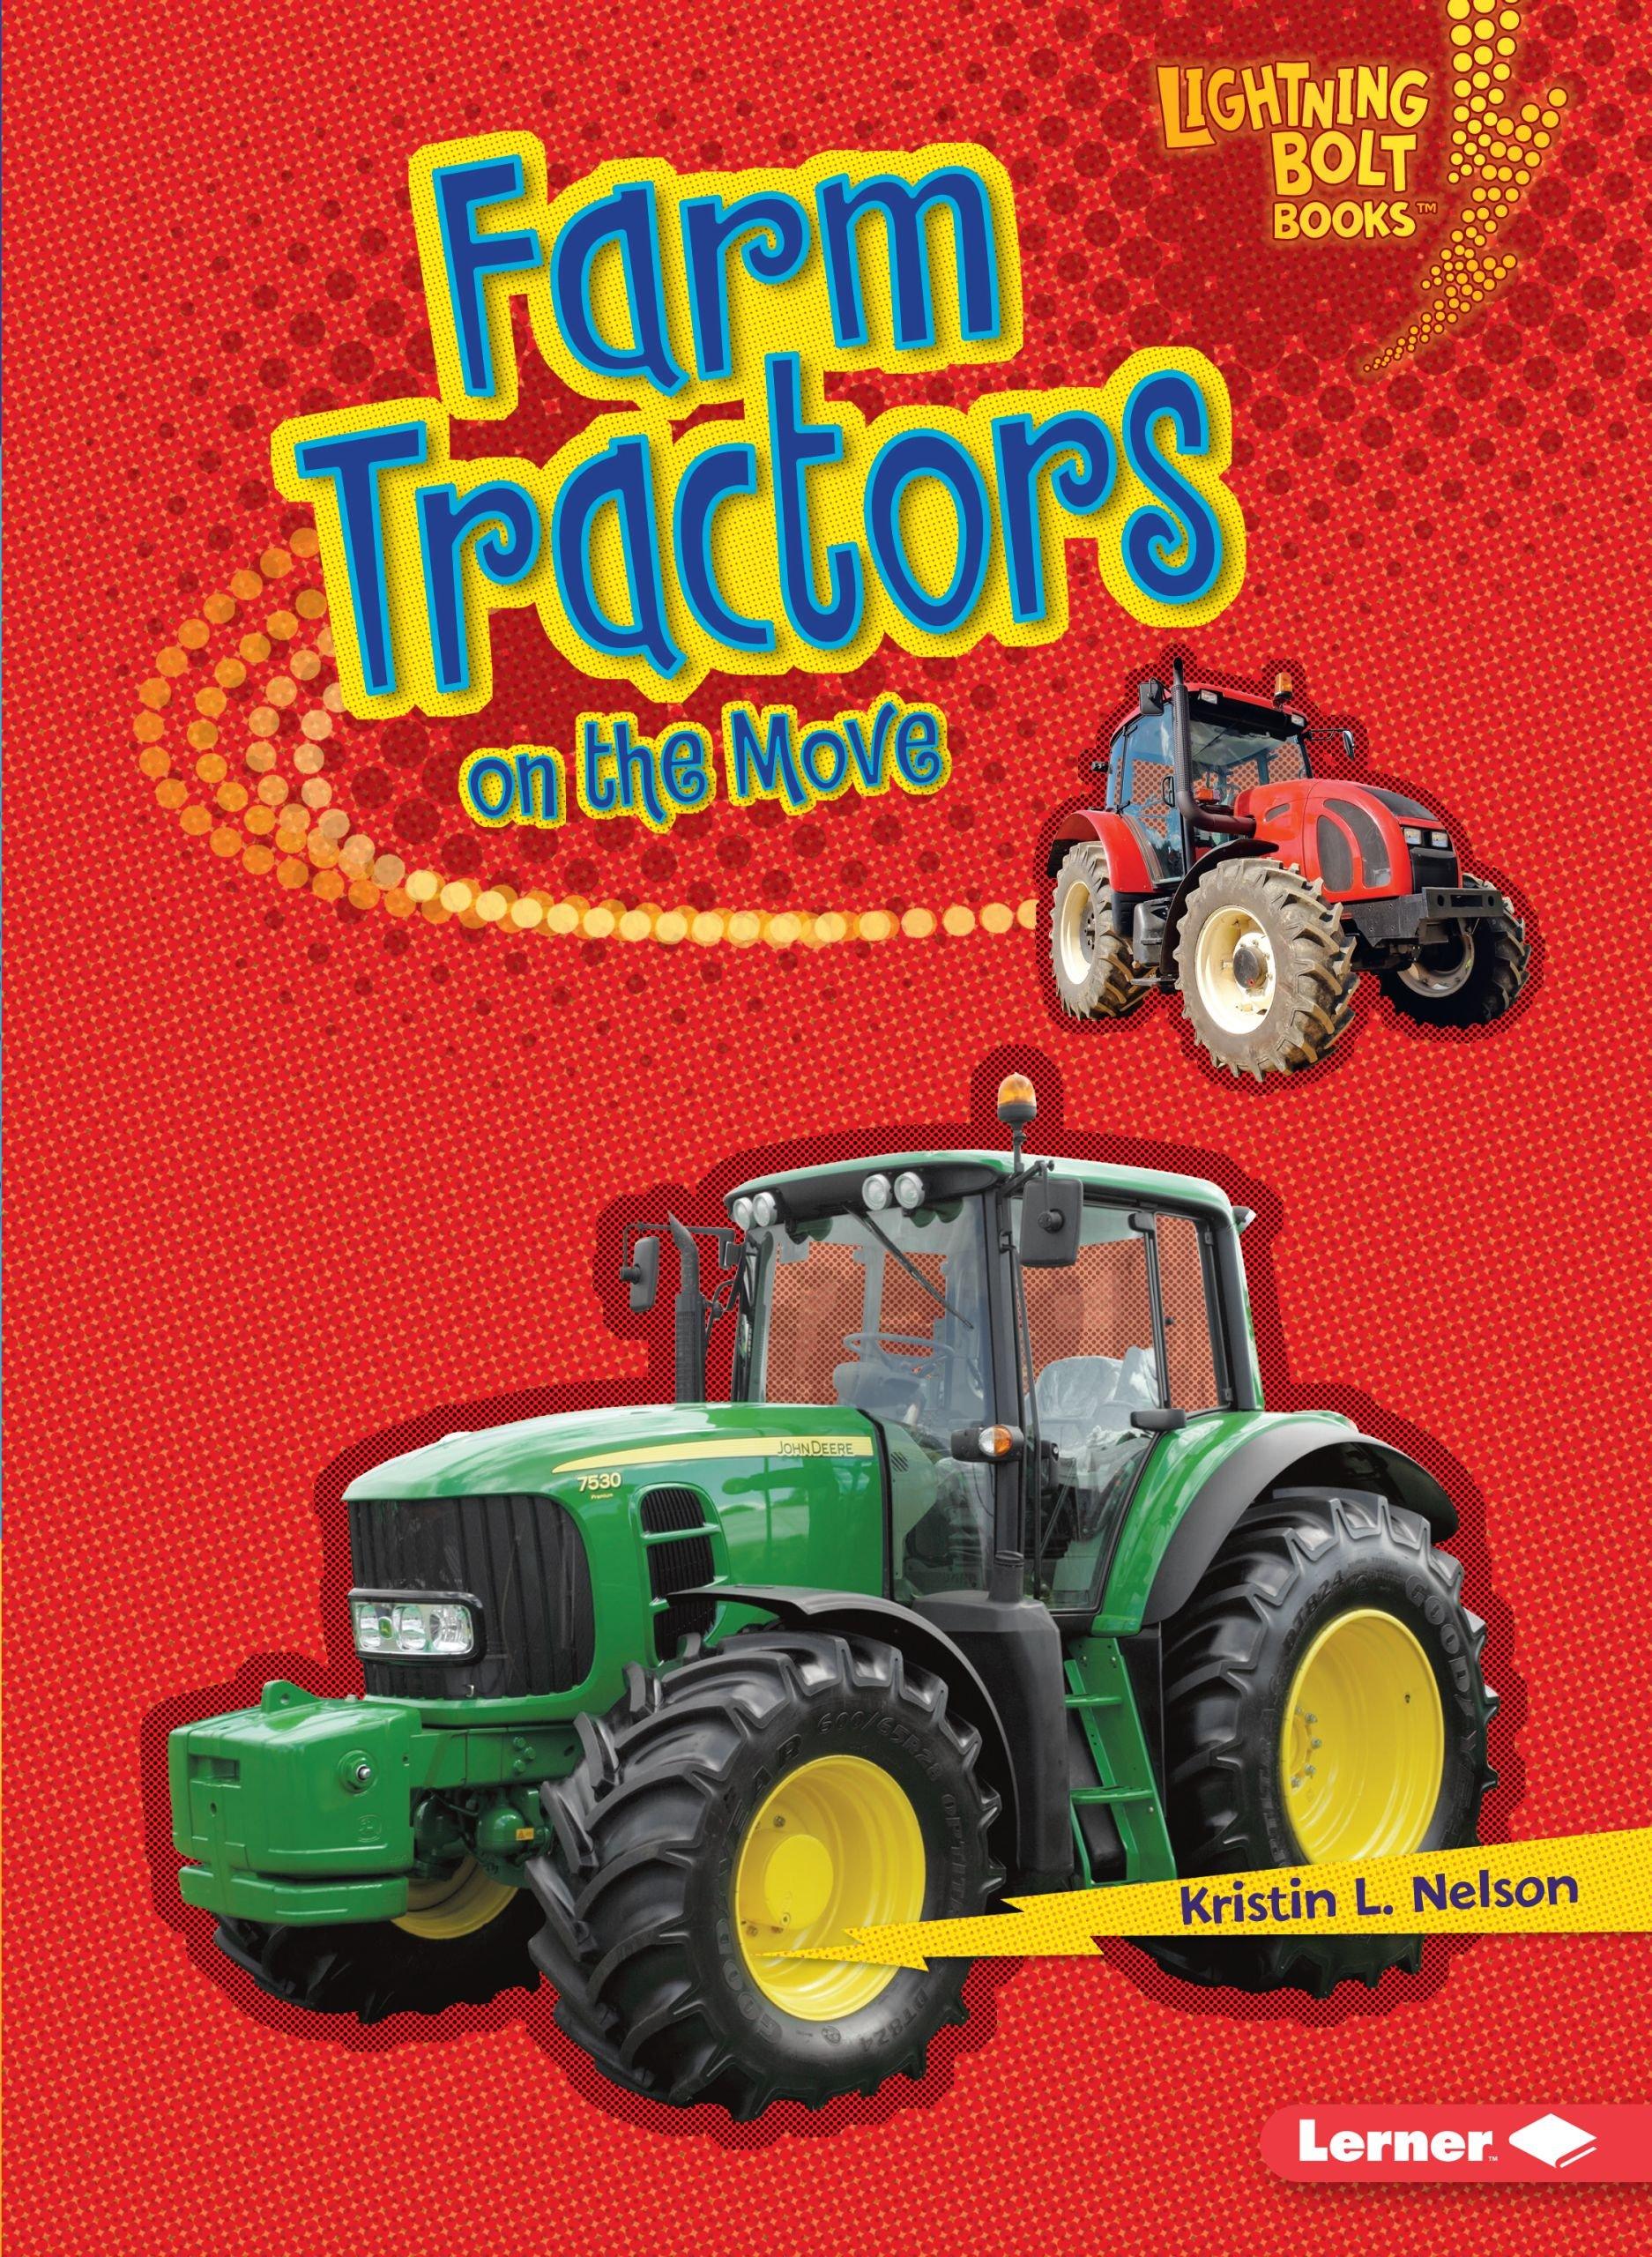 Farm Tractors on the Move (Lightning Bolt Books) ebook